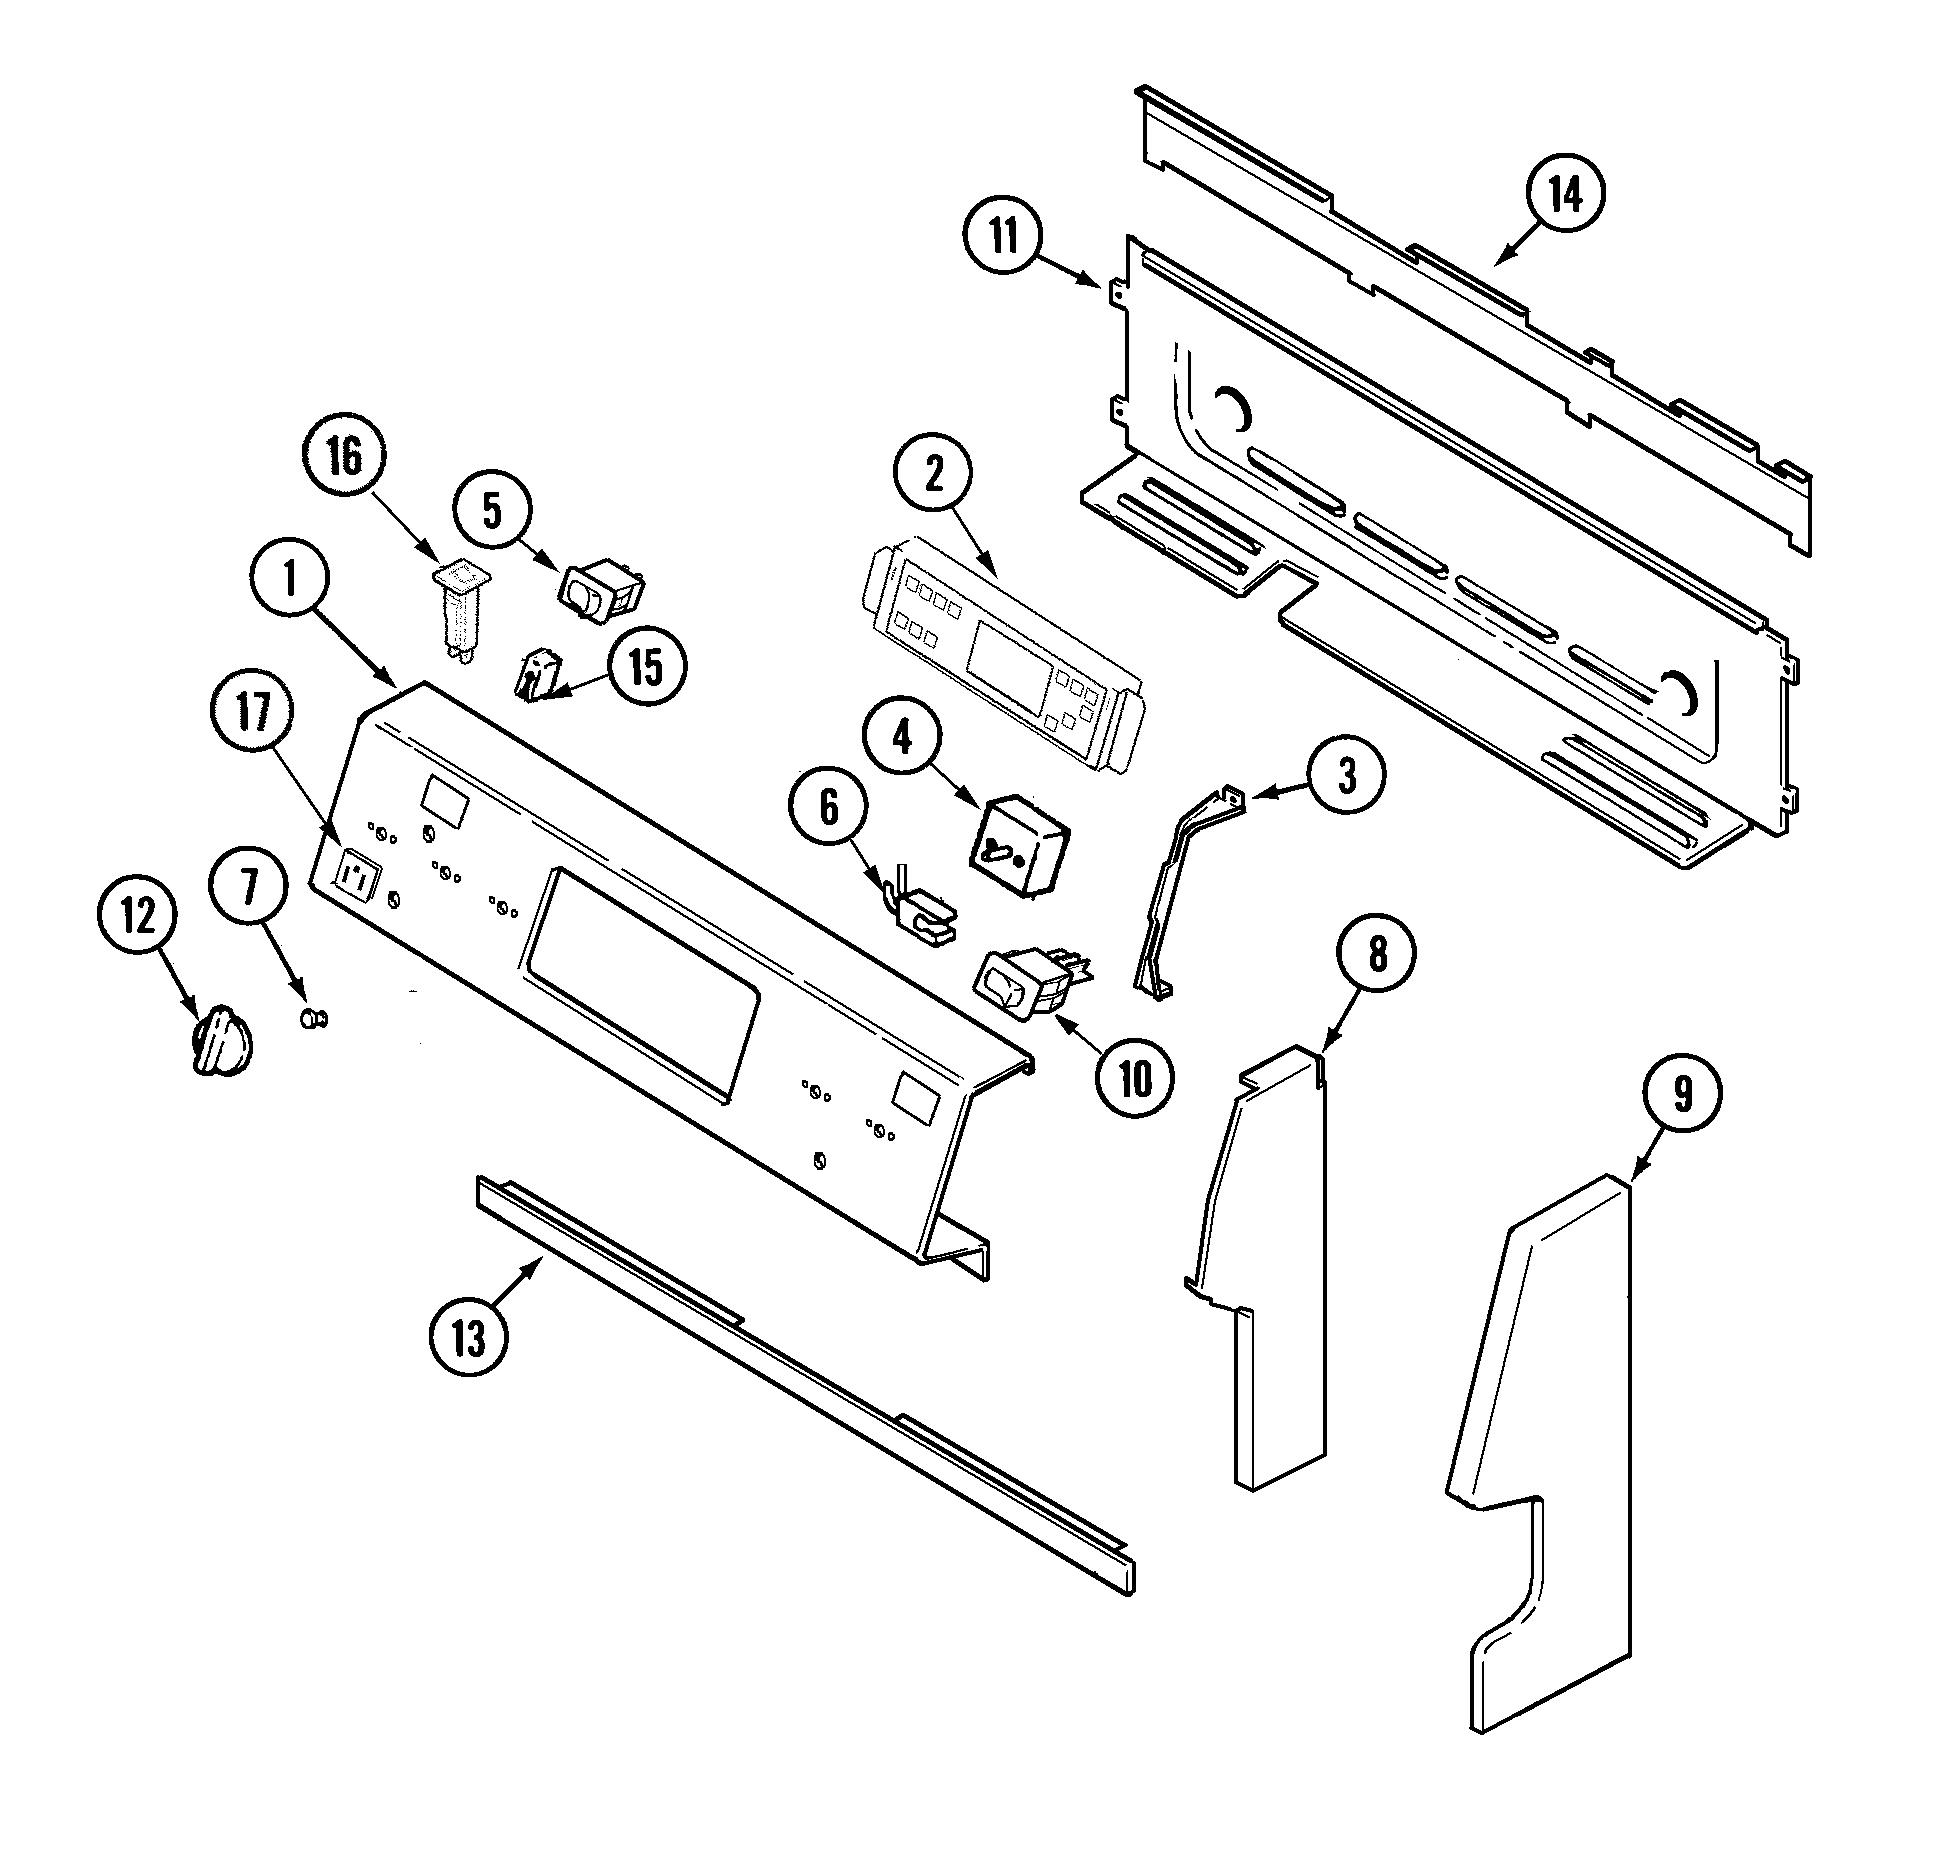 Kubota L175 Wiring Diagram 26 Images L345 Control Panel Partsresize6652c640 L48